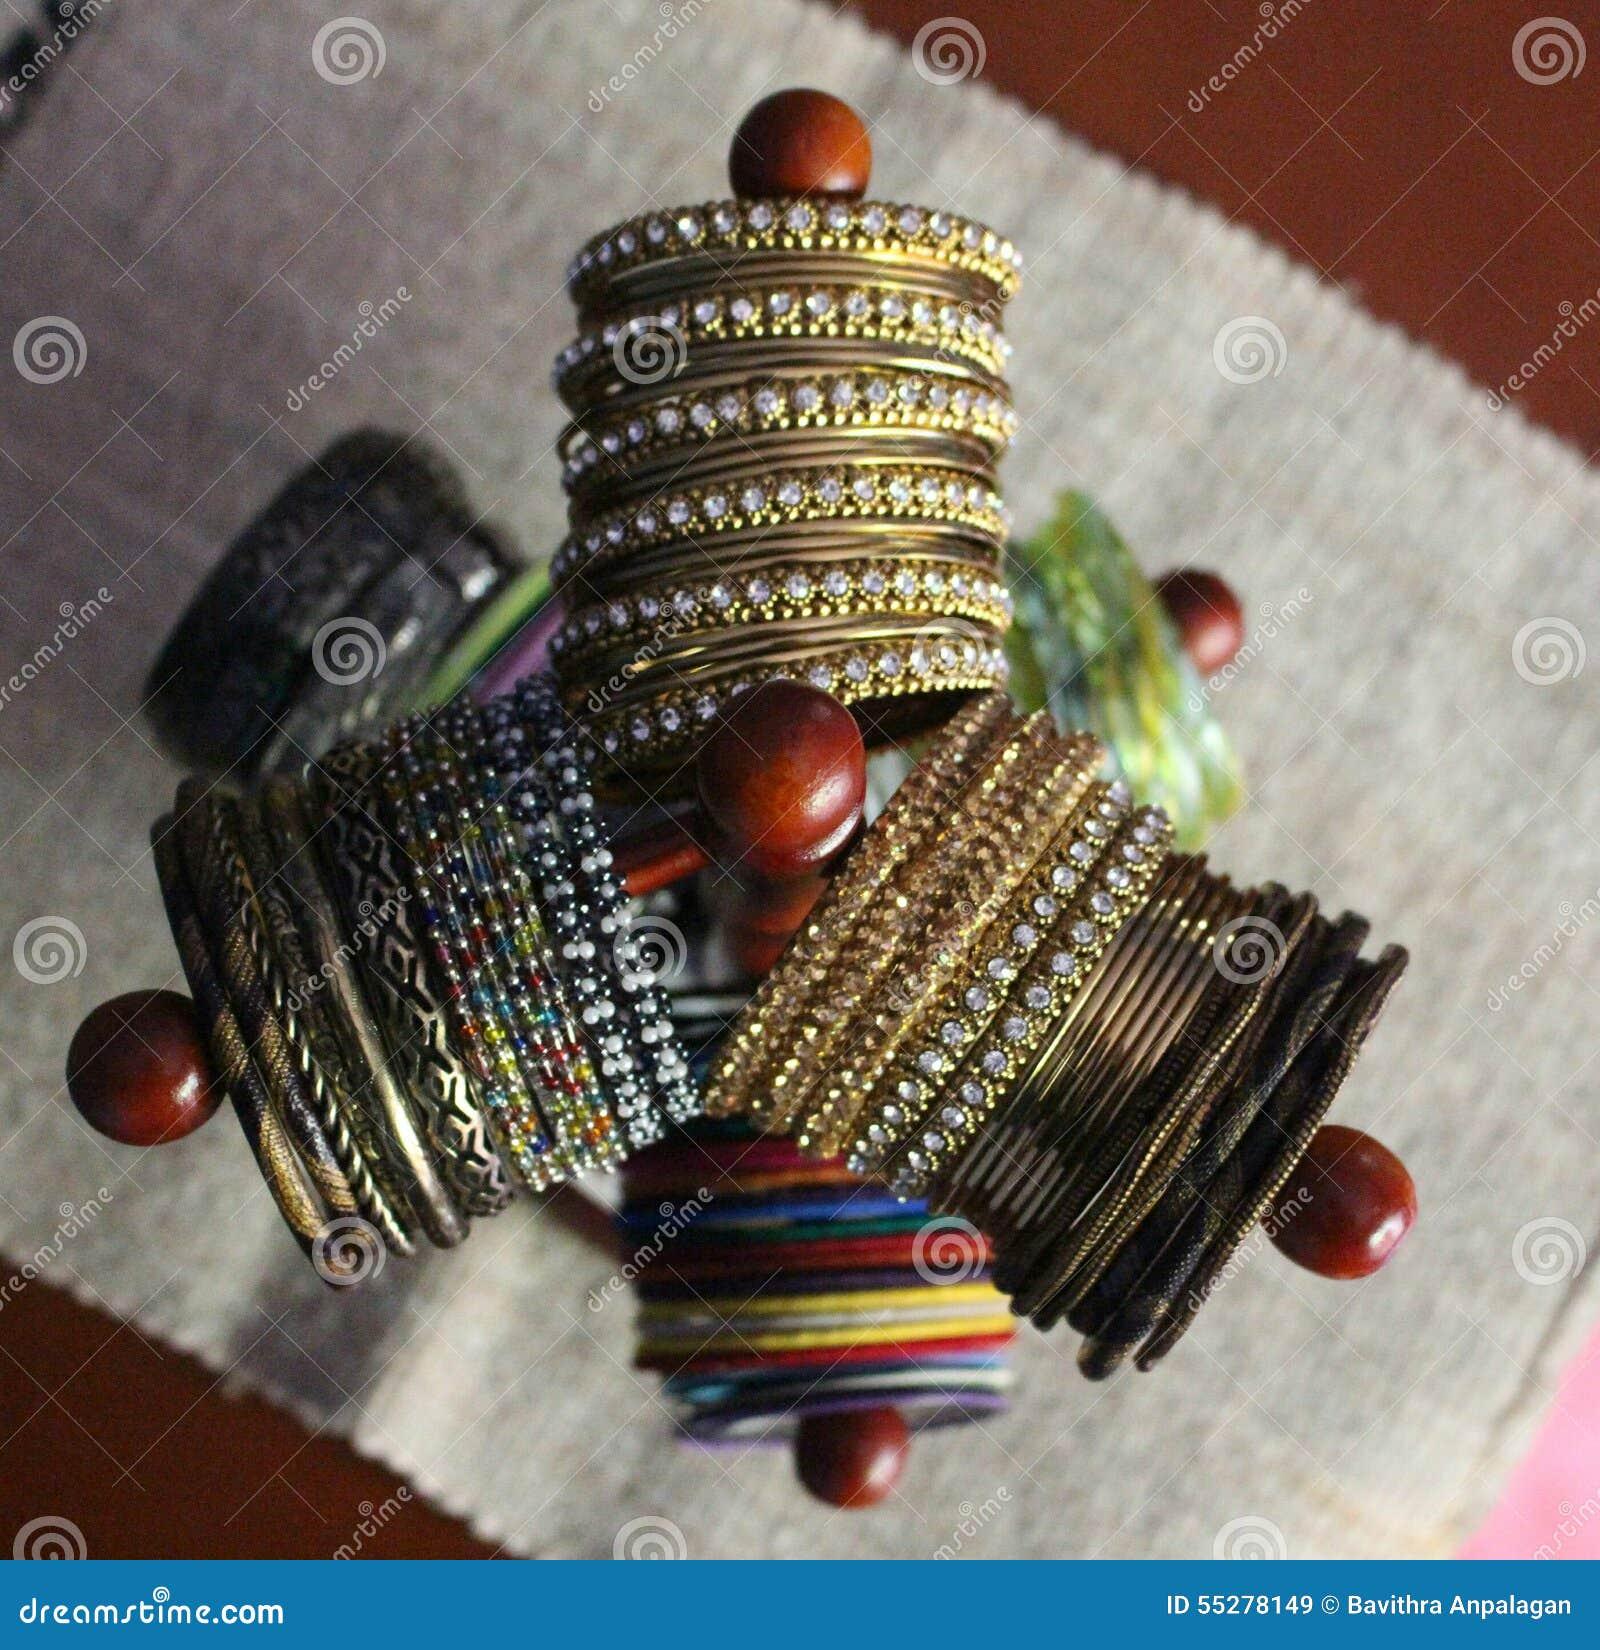 Bangle stand stock image. Image of bangles, gold, colour - 55278149